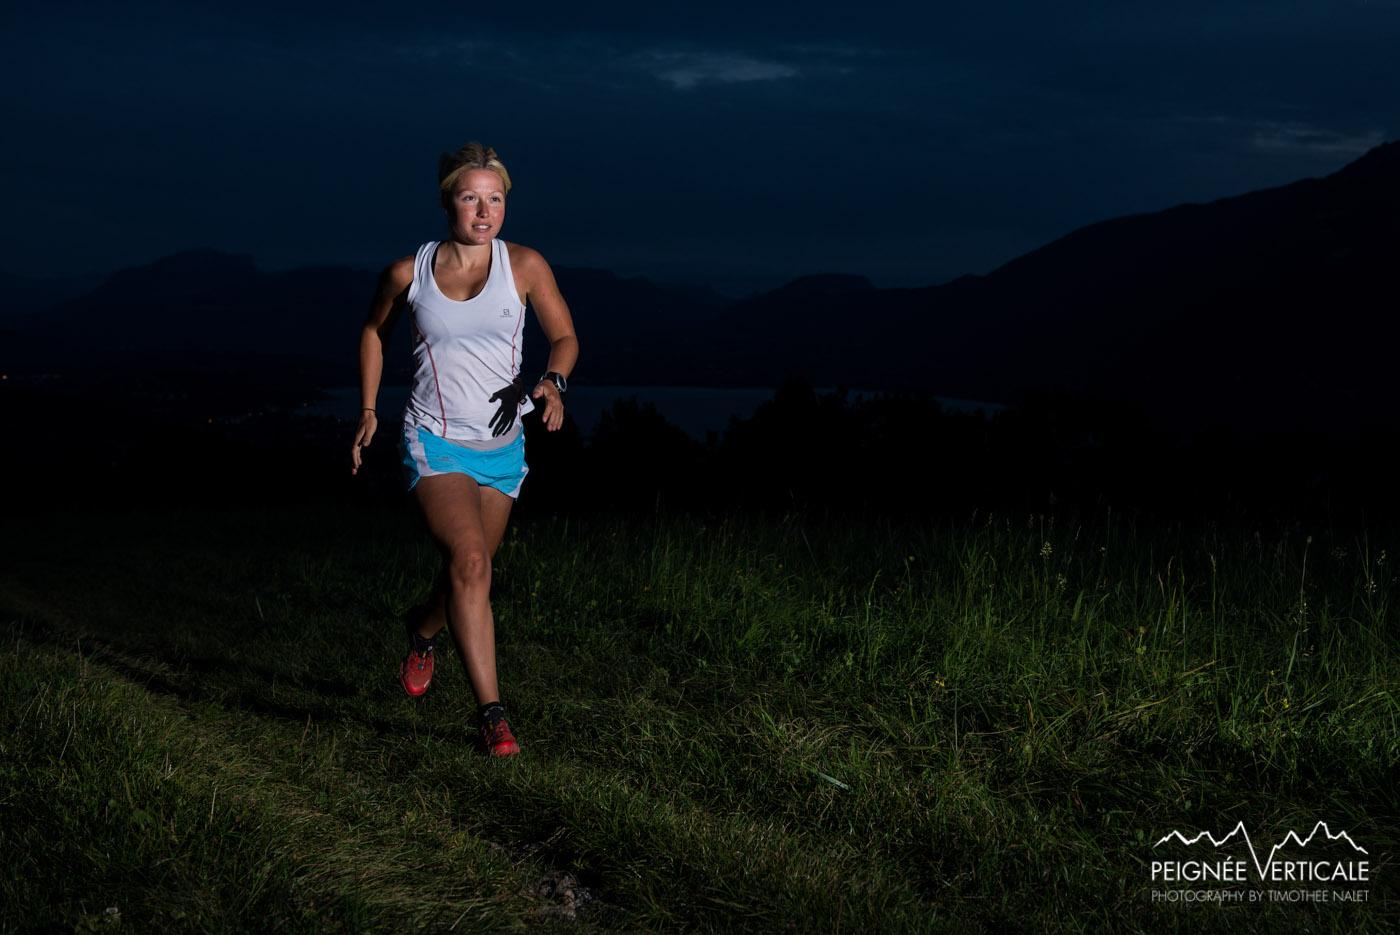 Timothee-Nalet-Laurie-Renoton-Running-night-5595.jpg